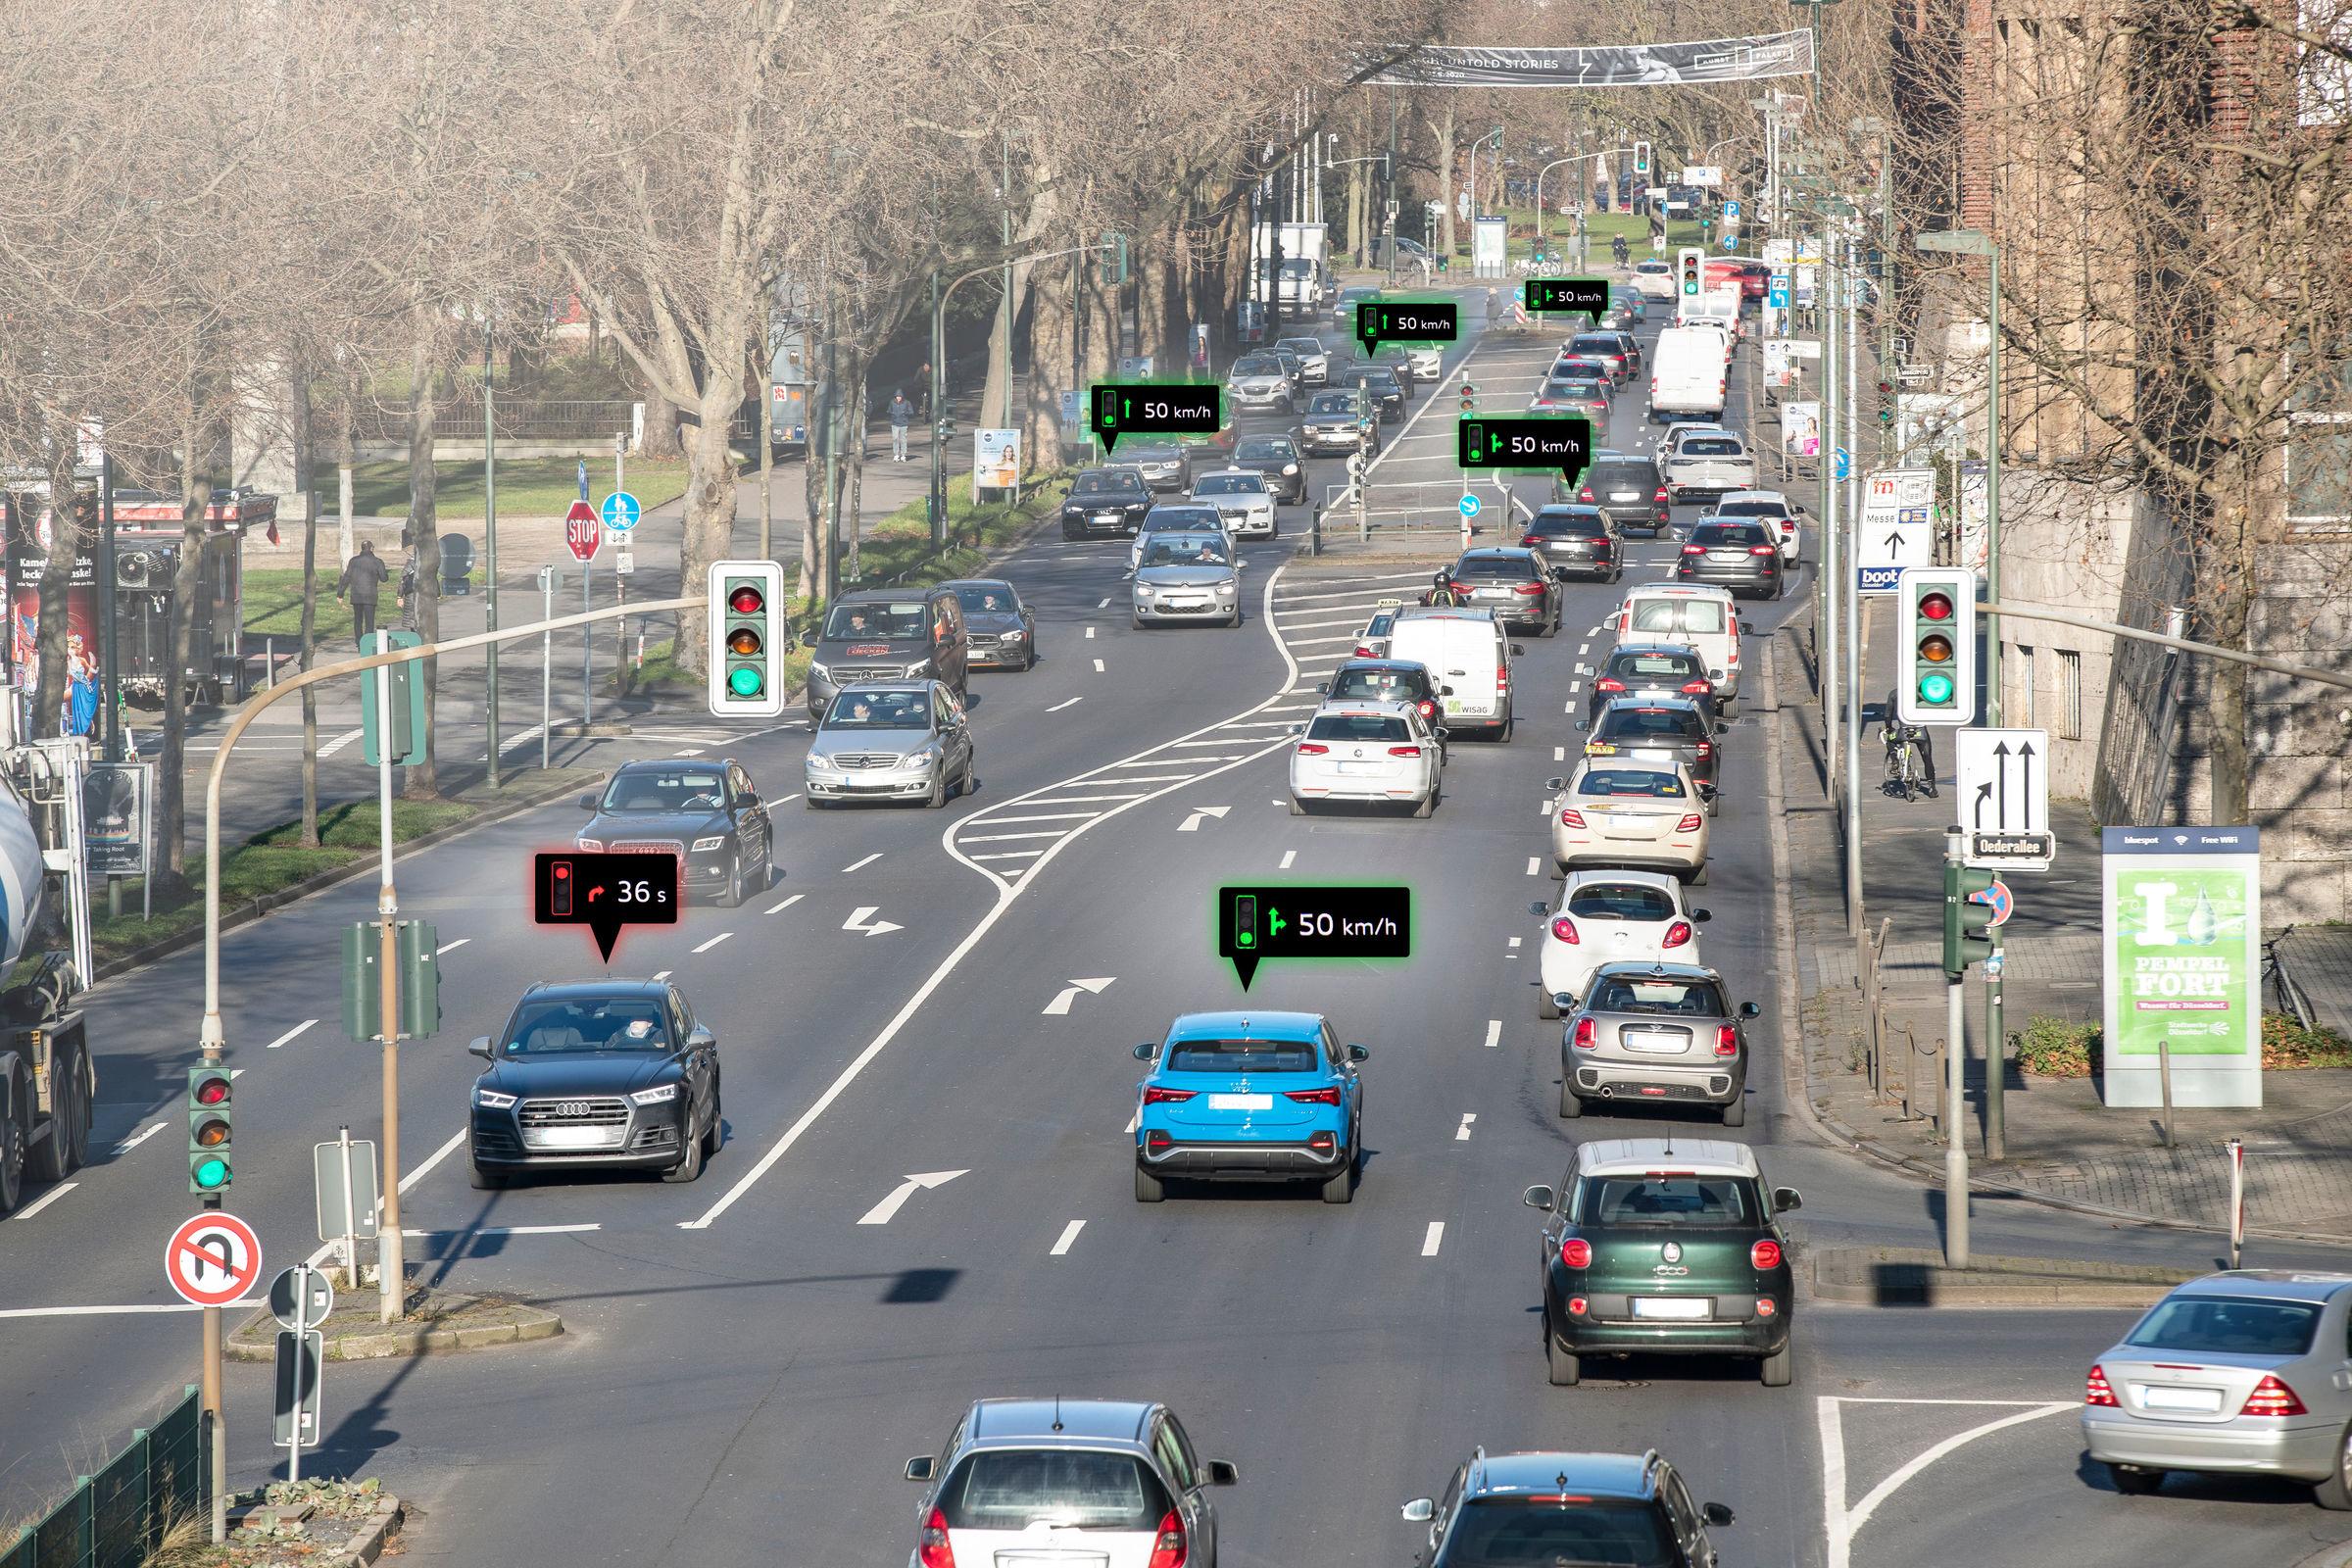 Audi networks with traffic lights in Düsseldorf - Image 6